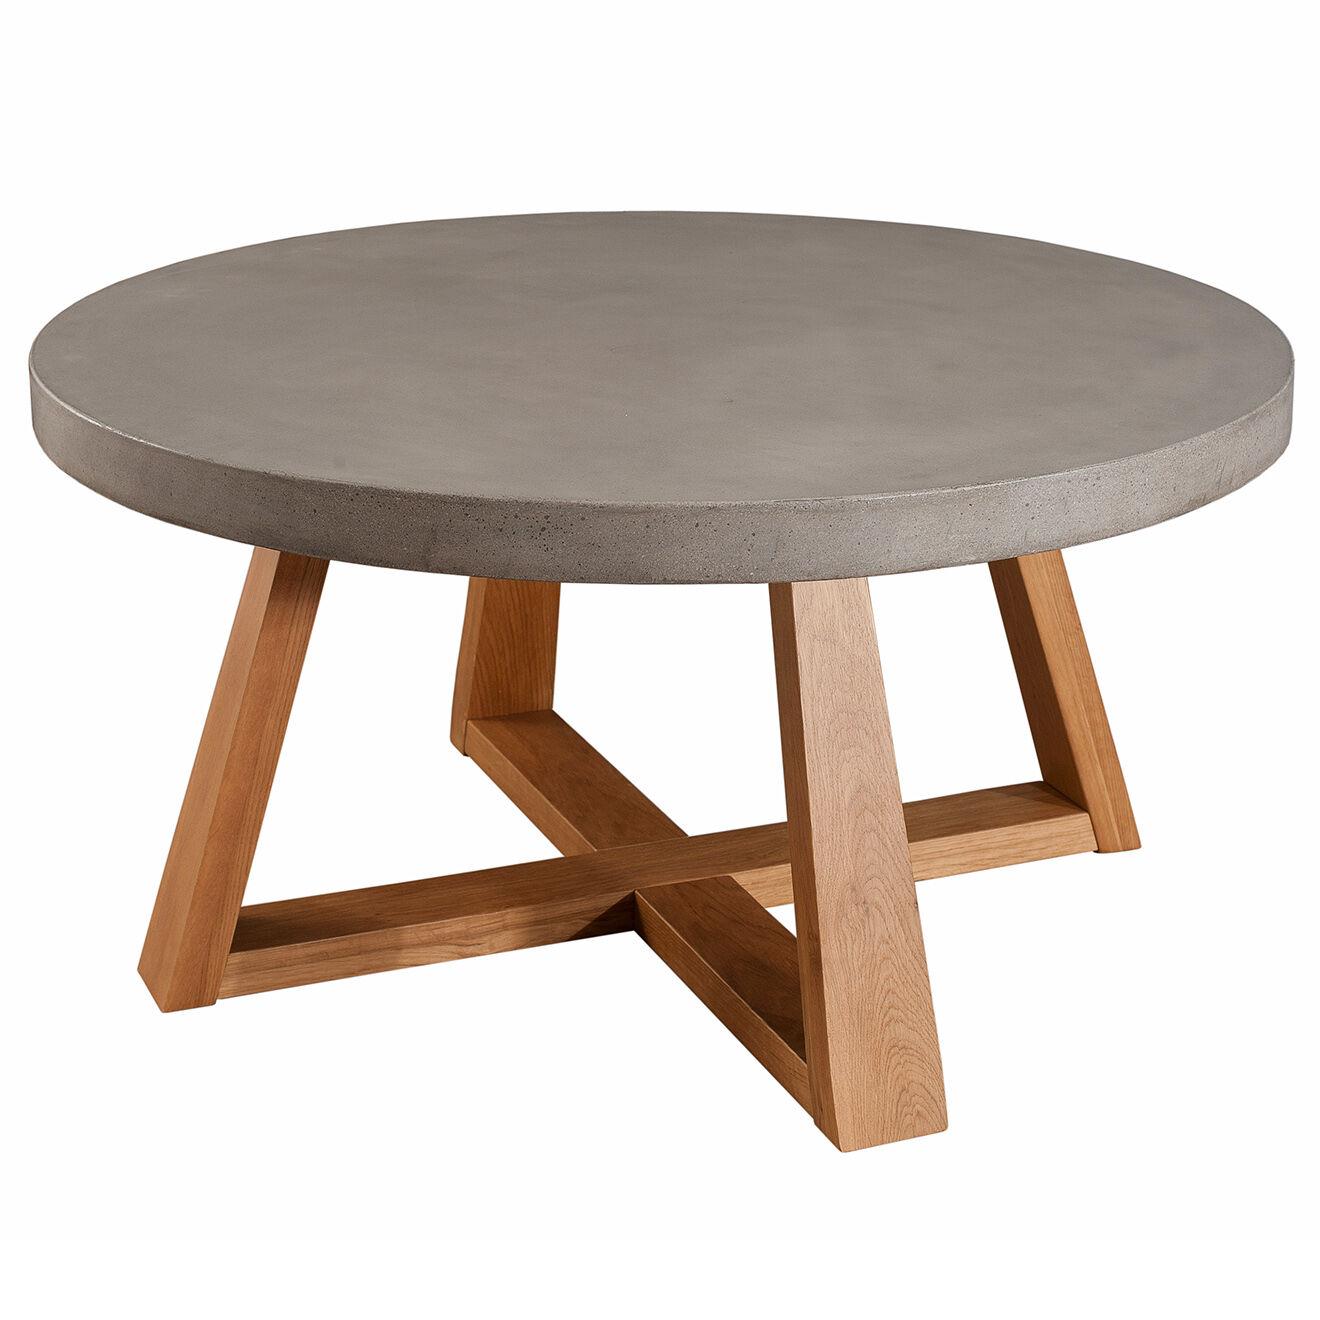 Table basse ronde Nicola Chêne clair/béton - D.91xH.47cm